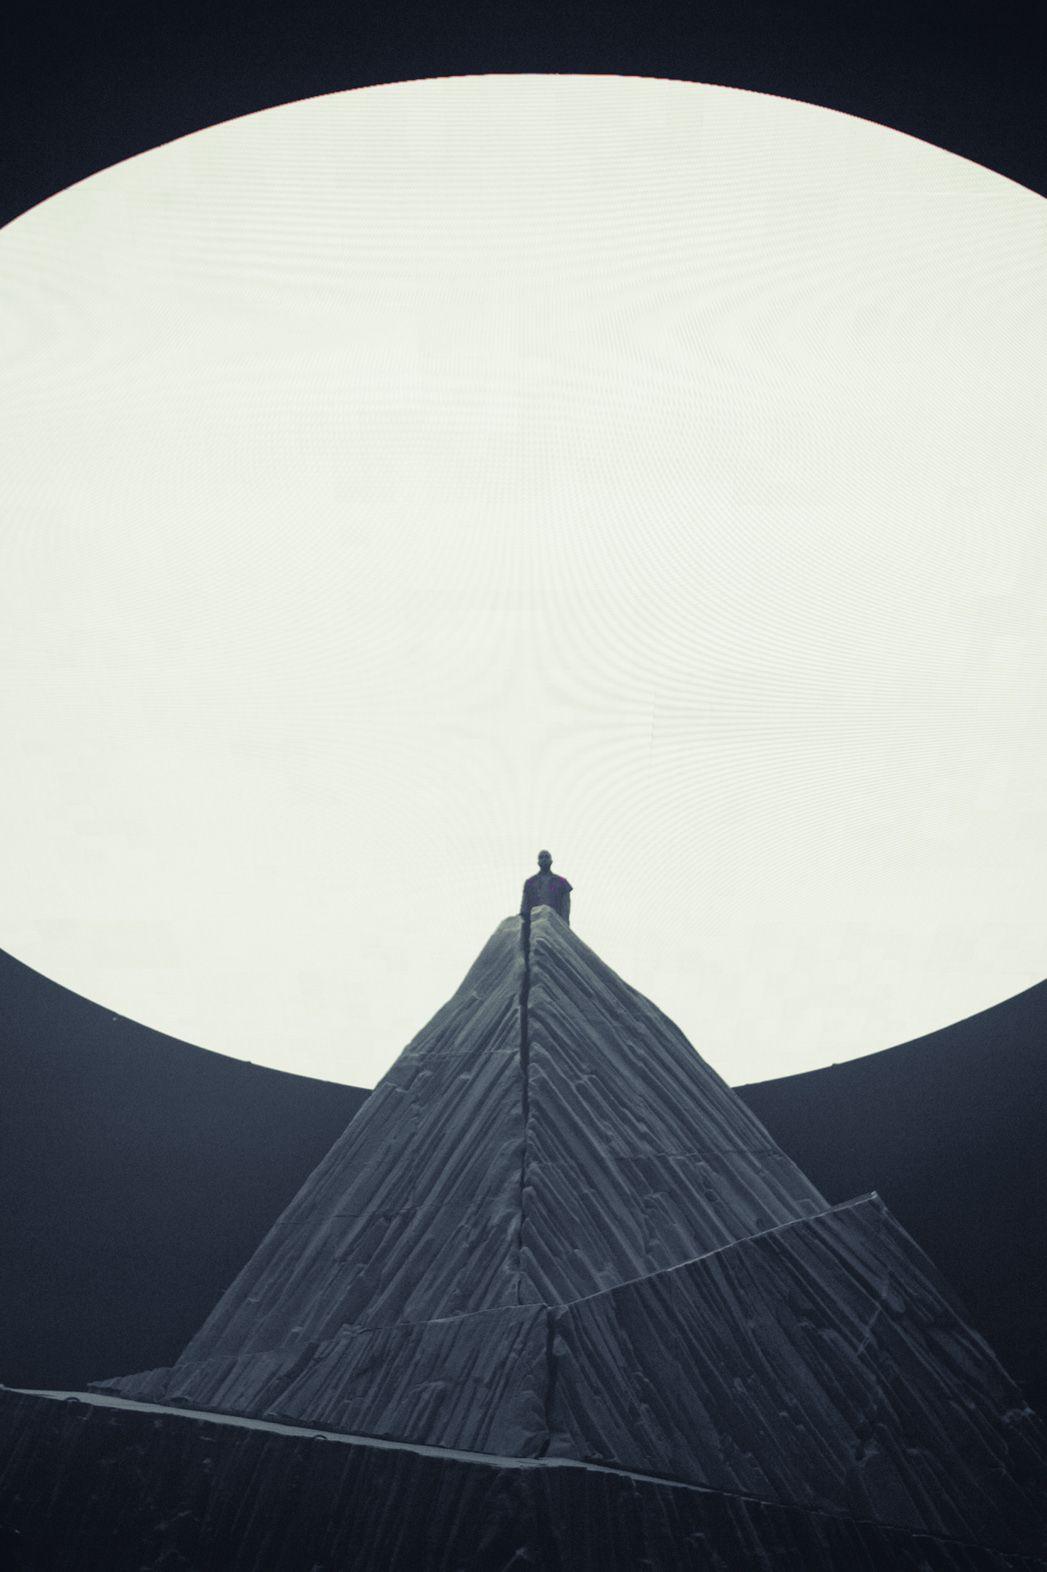 Kanye West Yeezus Tour Concept Virgil Abloh Donda Design De Mise En Scene Scenography Kanye West Yeezus